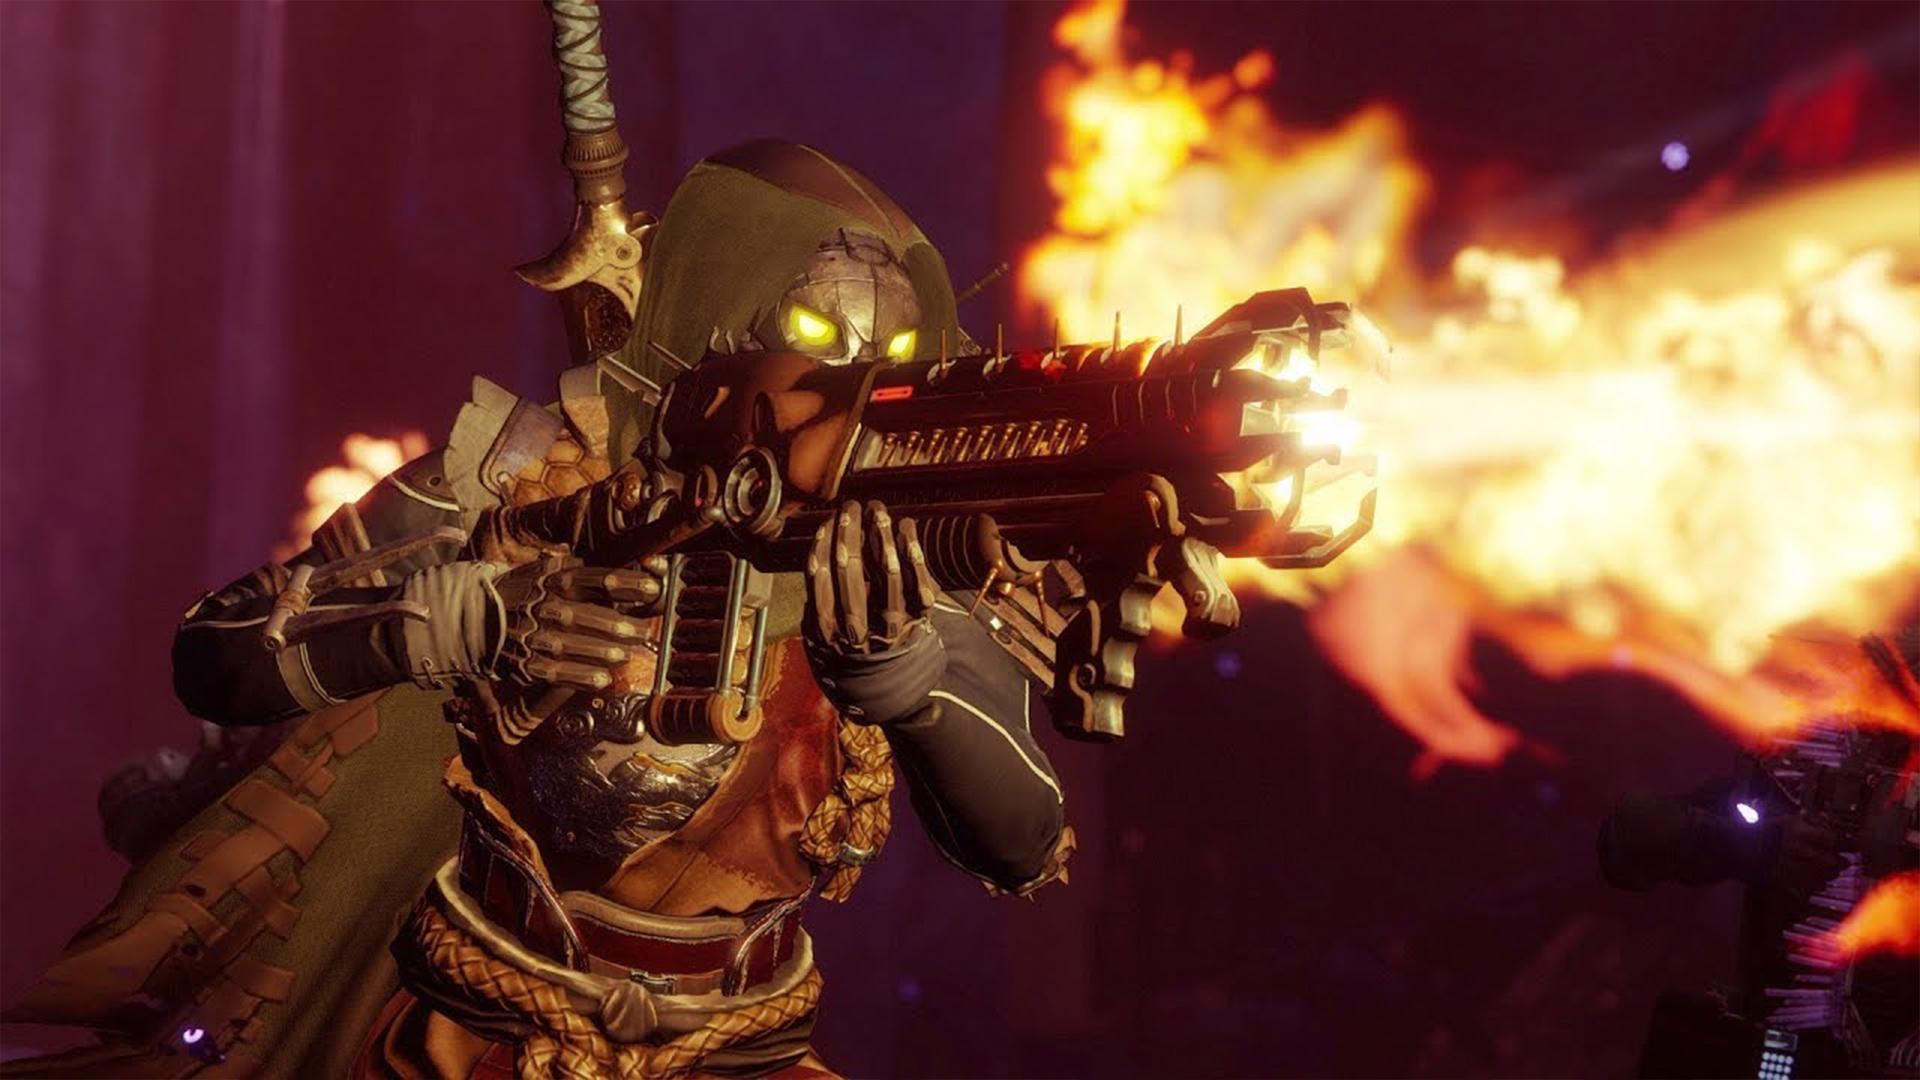 Destiny 2 Shattered Throne Guide How To Beat The Forsaken Dungeon PCGamesN